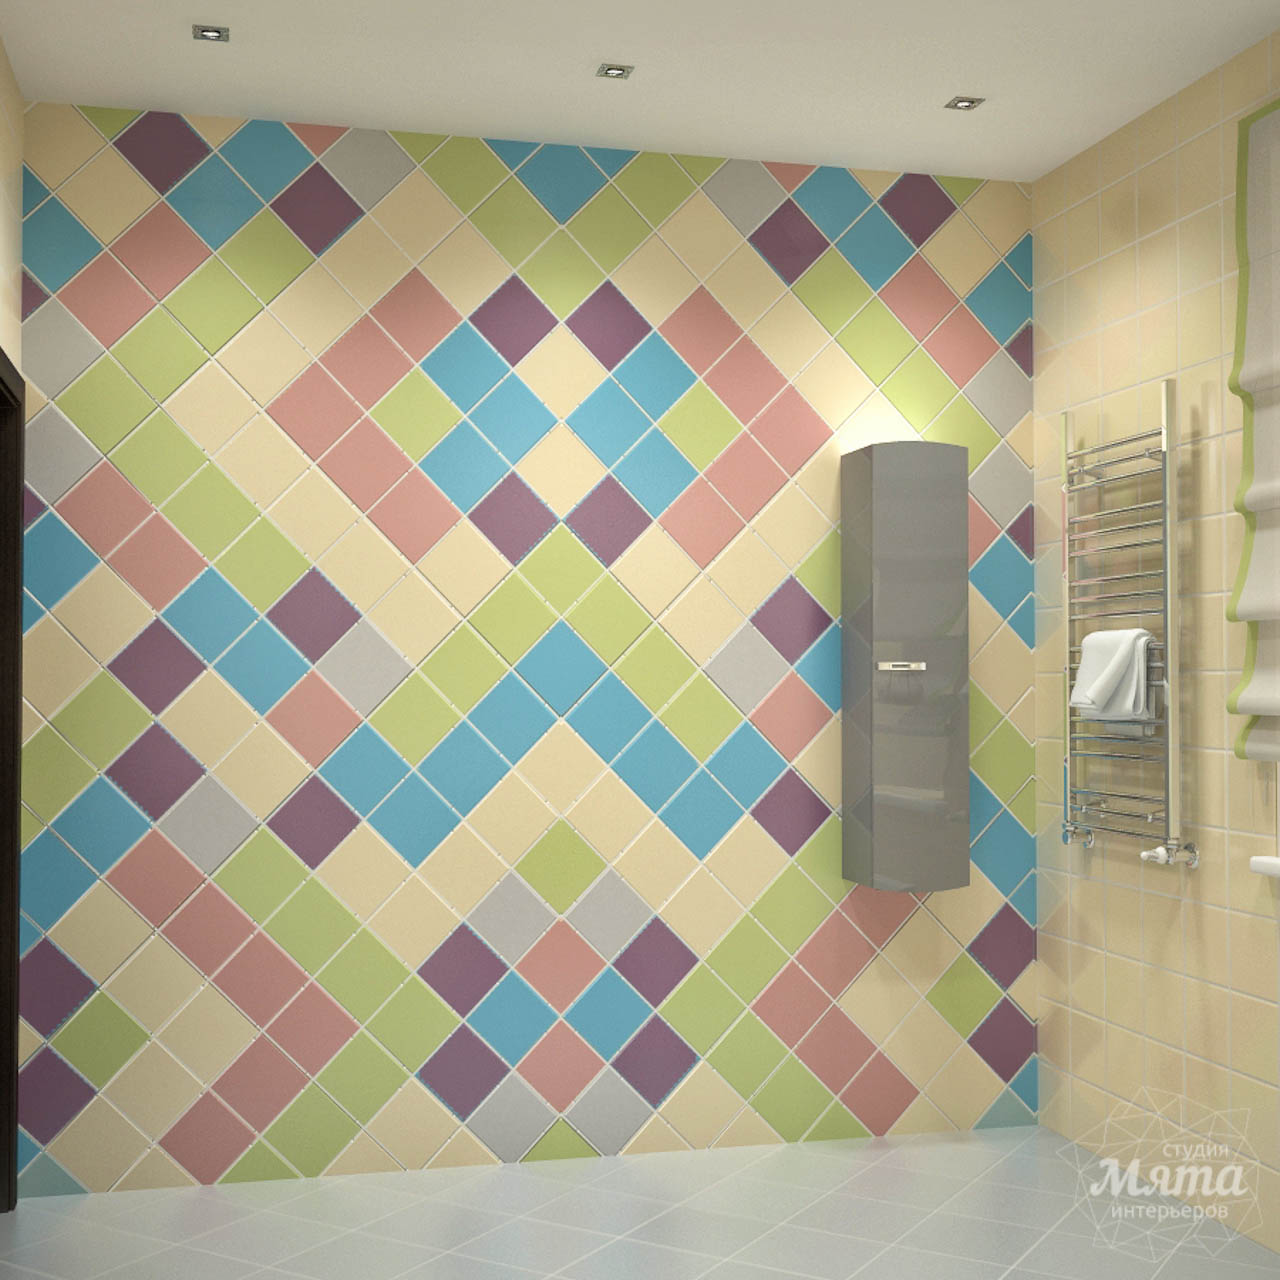 Дизайн проект интерьера коттеджа  в стиле минимализм по ул. Барвинка 15 img1740848145